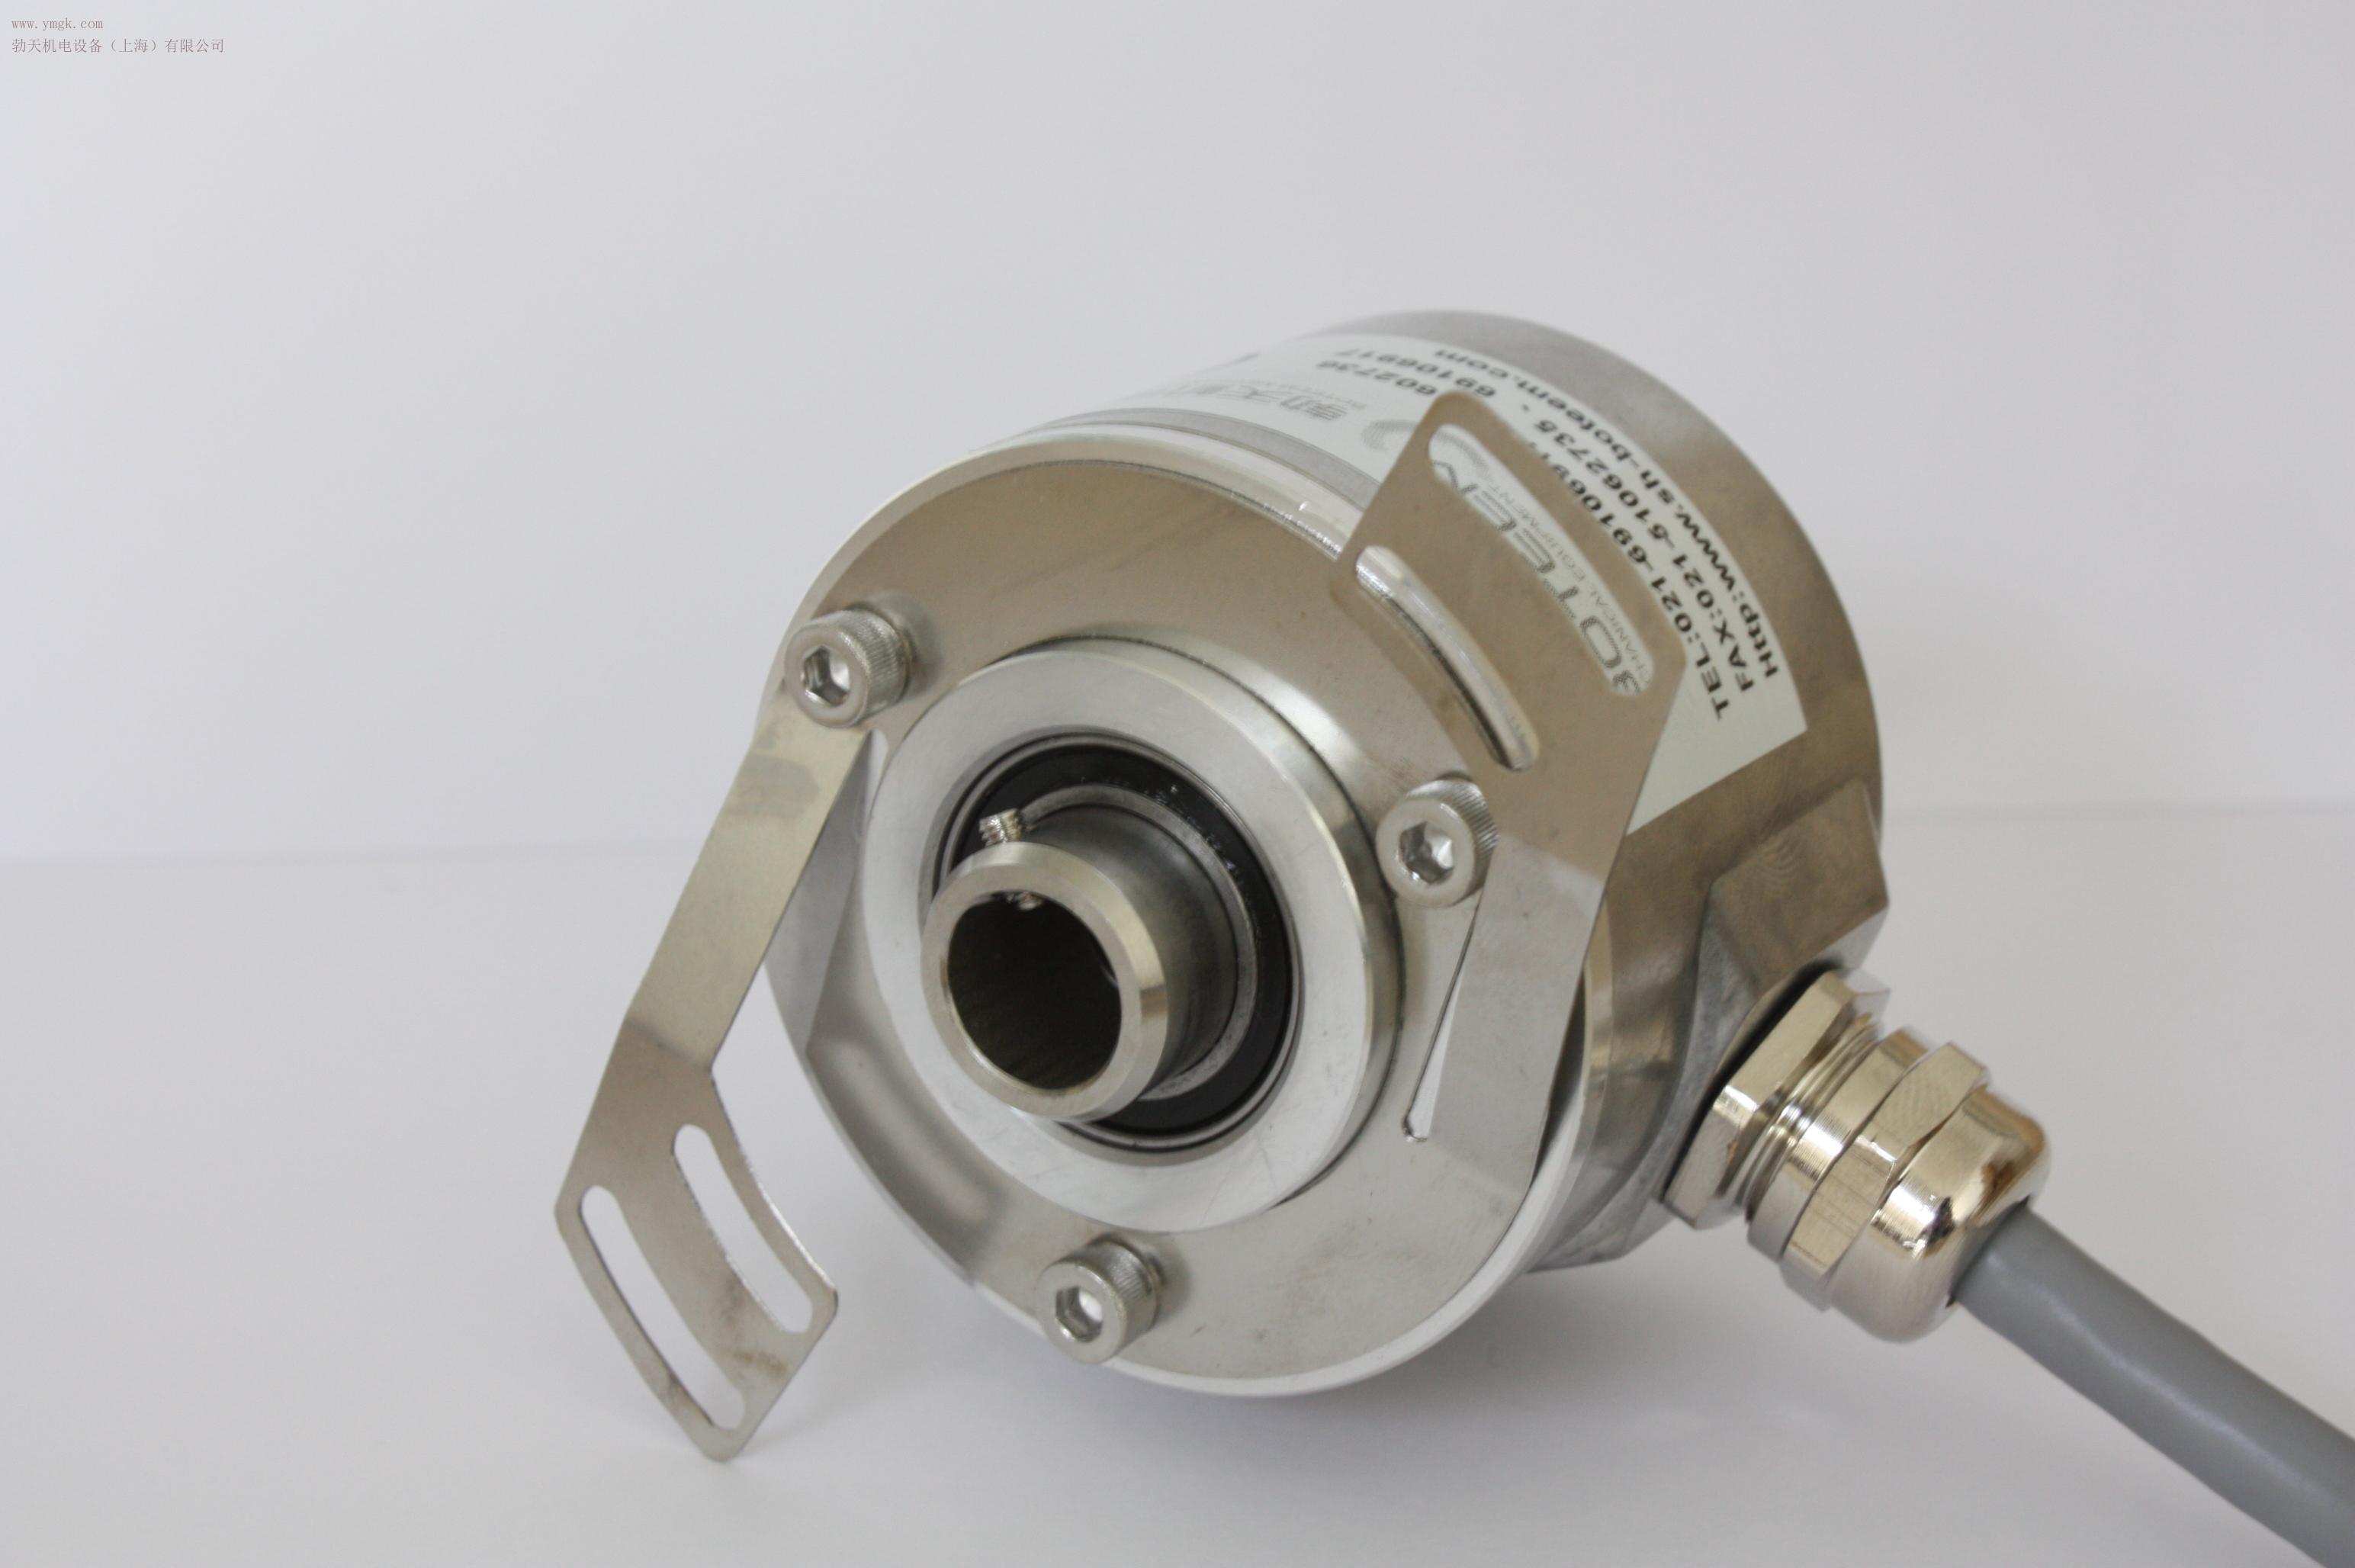 4-20ma多圈编码器 单圈防水型profibs-dp编码器 0-10v信号编码器 ssi